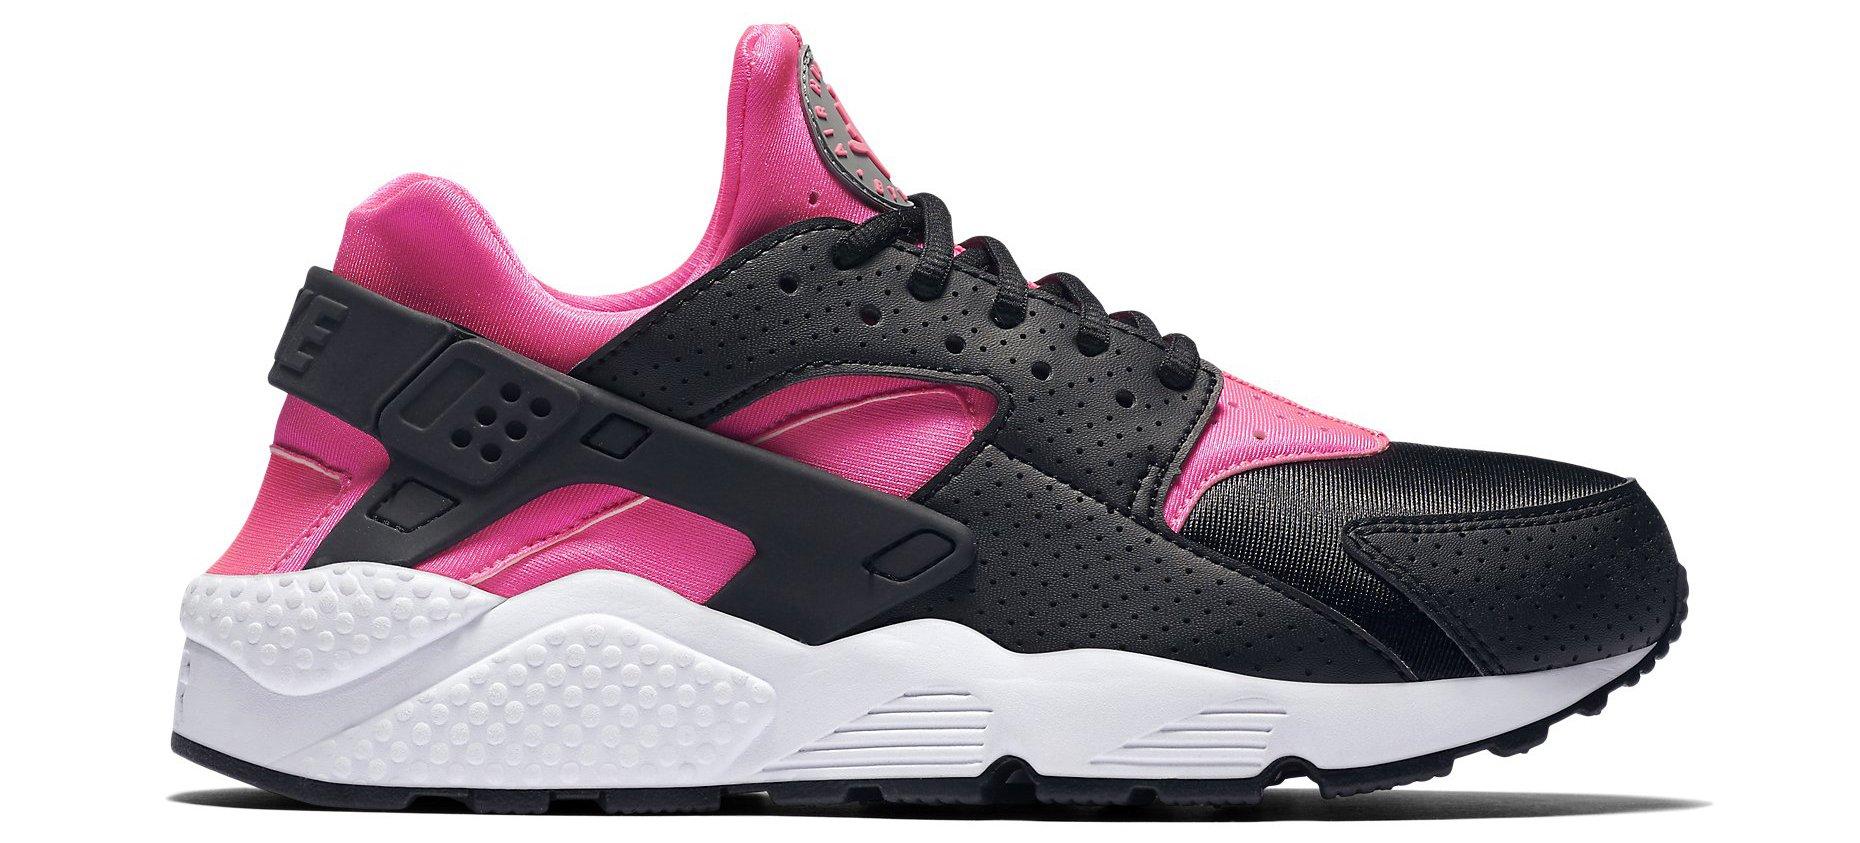 Boty Nike Air Huarache Run